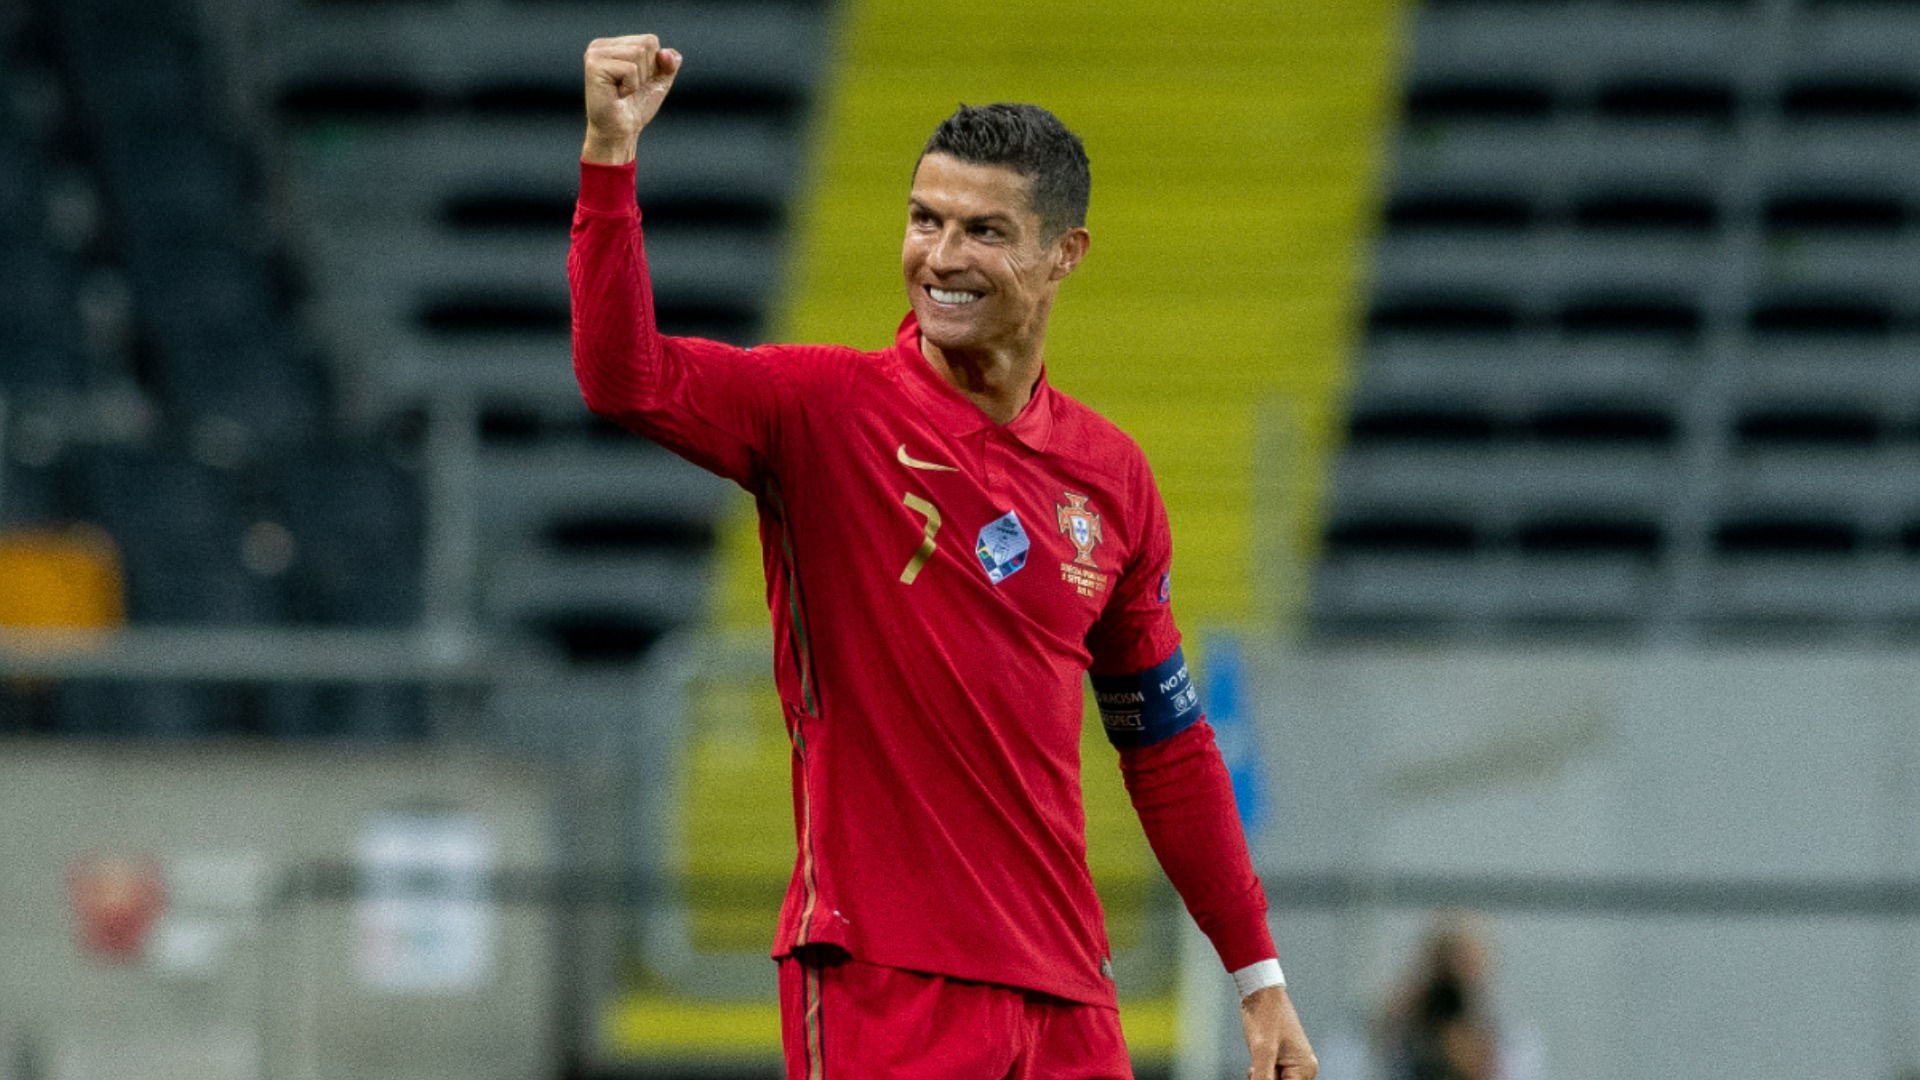 Sweden 0-2 Portugal: Ronaldo gets 100th international goal in stunning brace